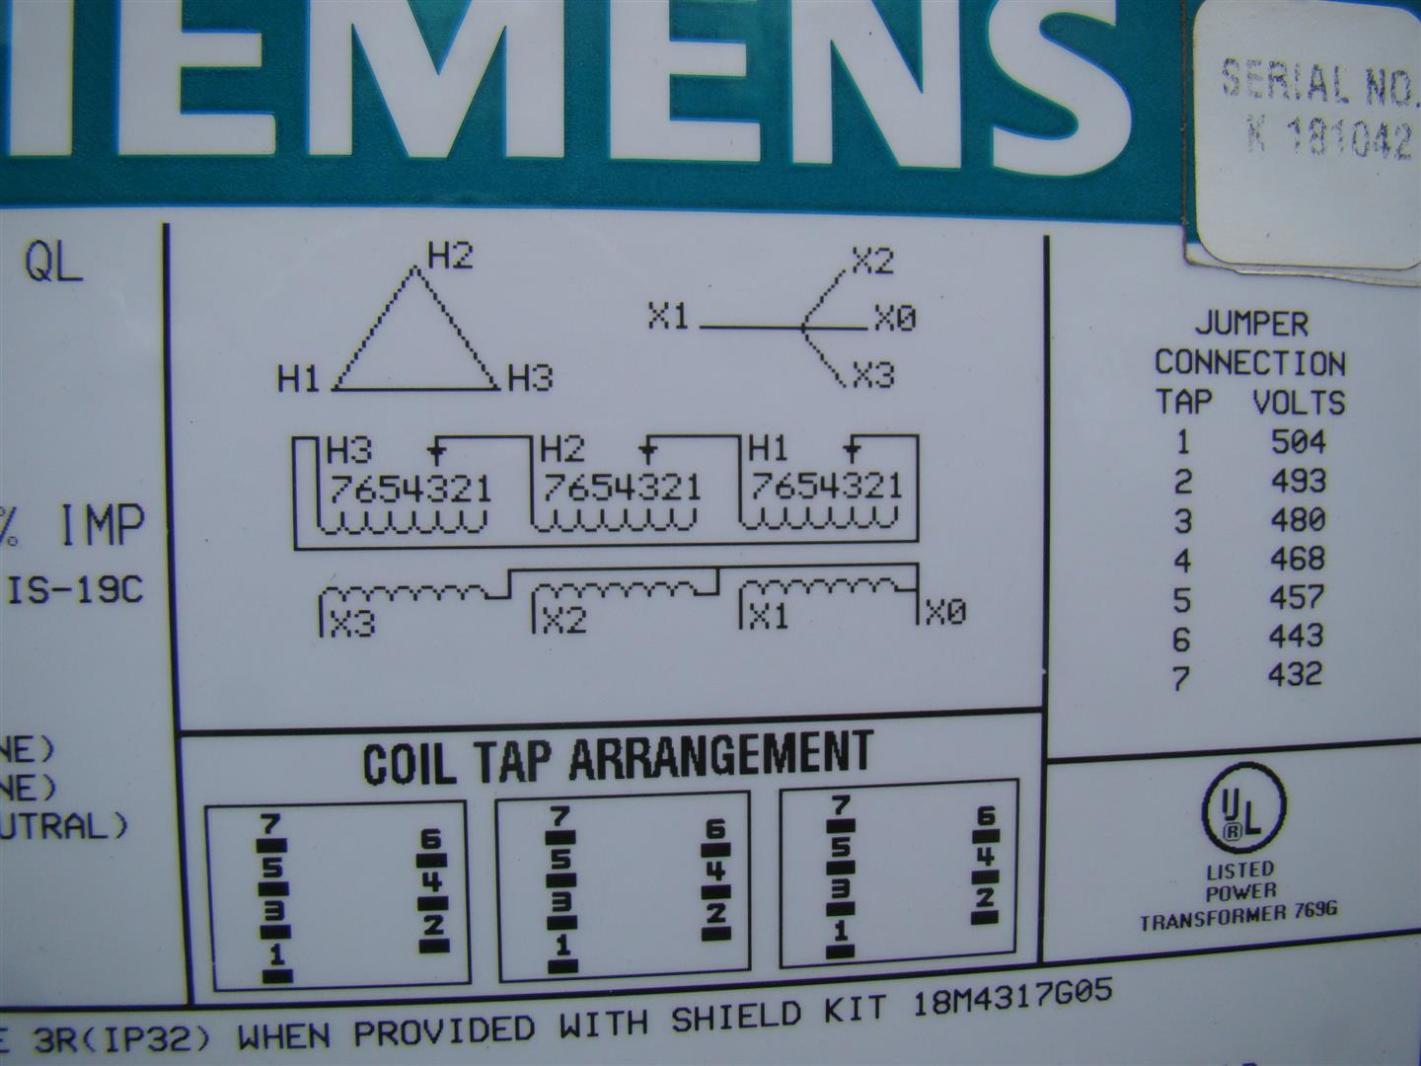 hight resolution of  100 480 three phase transformer wiring yasminroohi volt transformer wiring diagram on 480 power